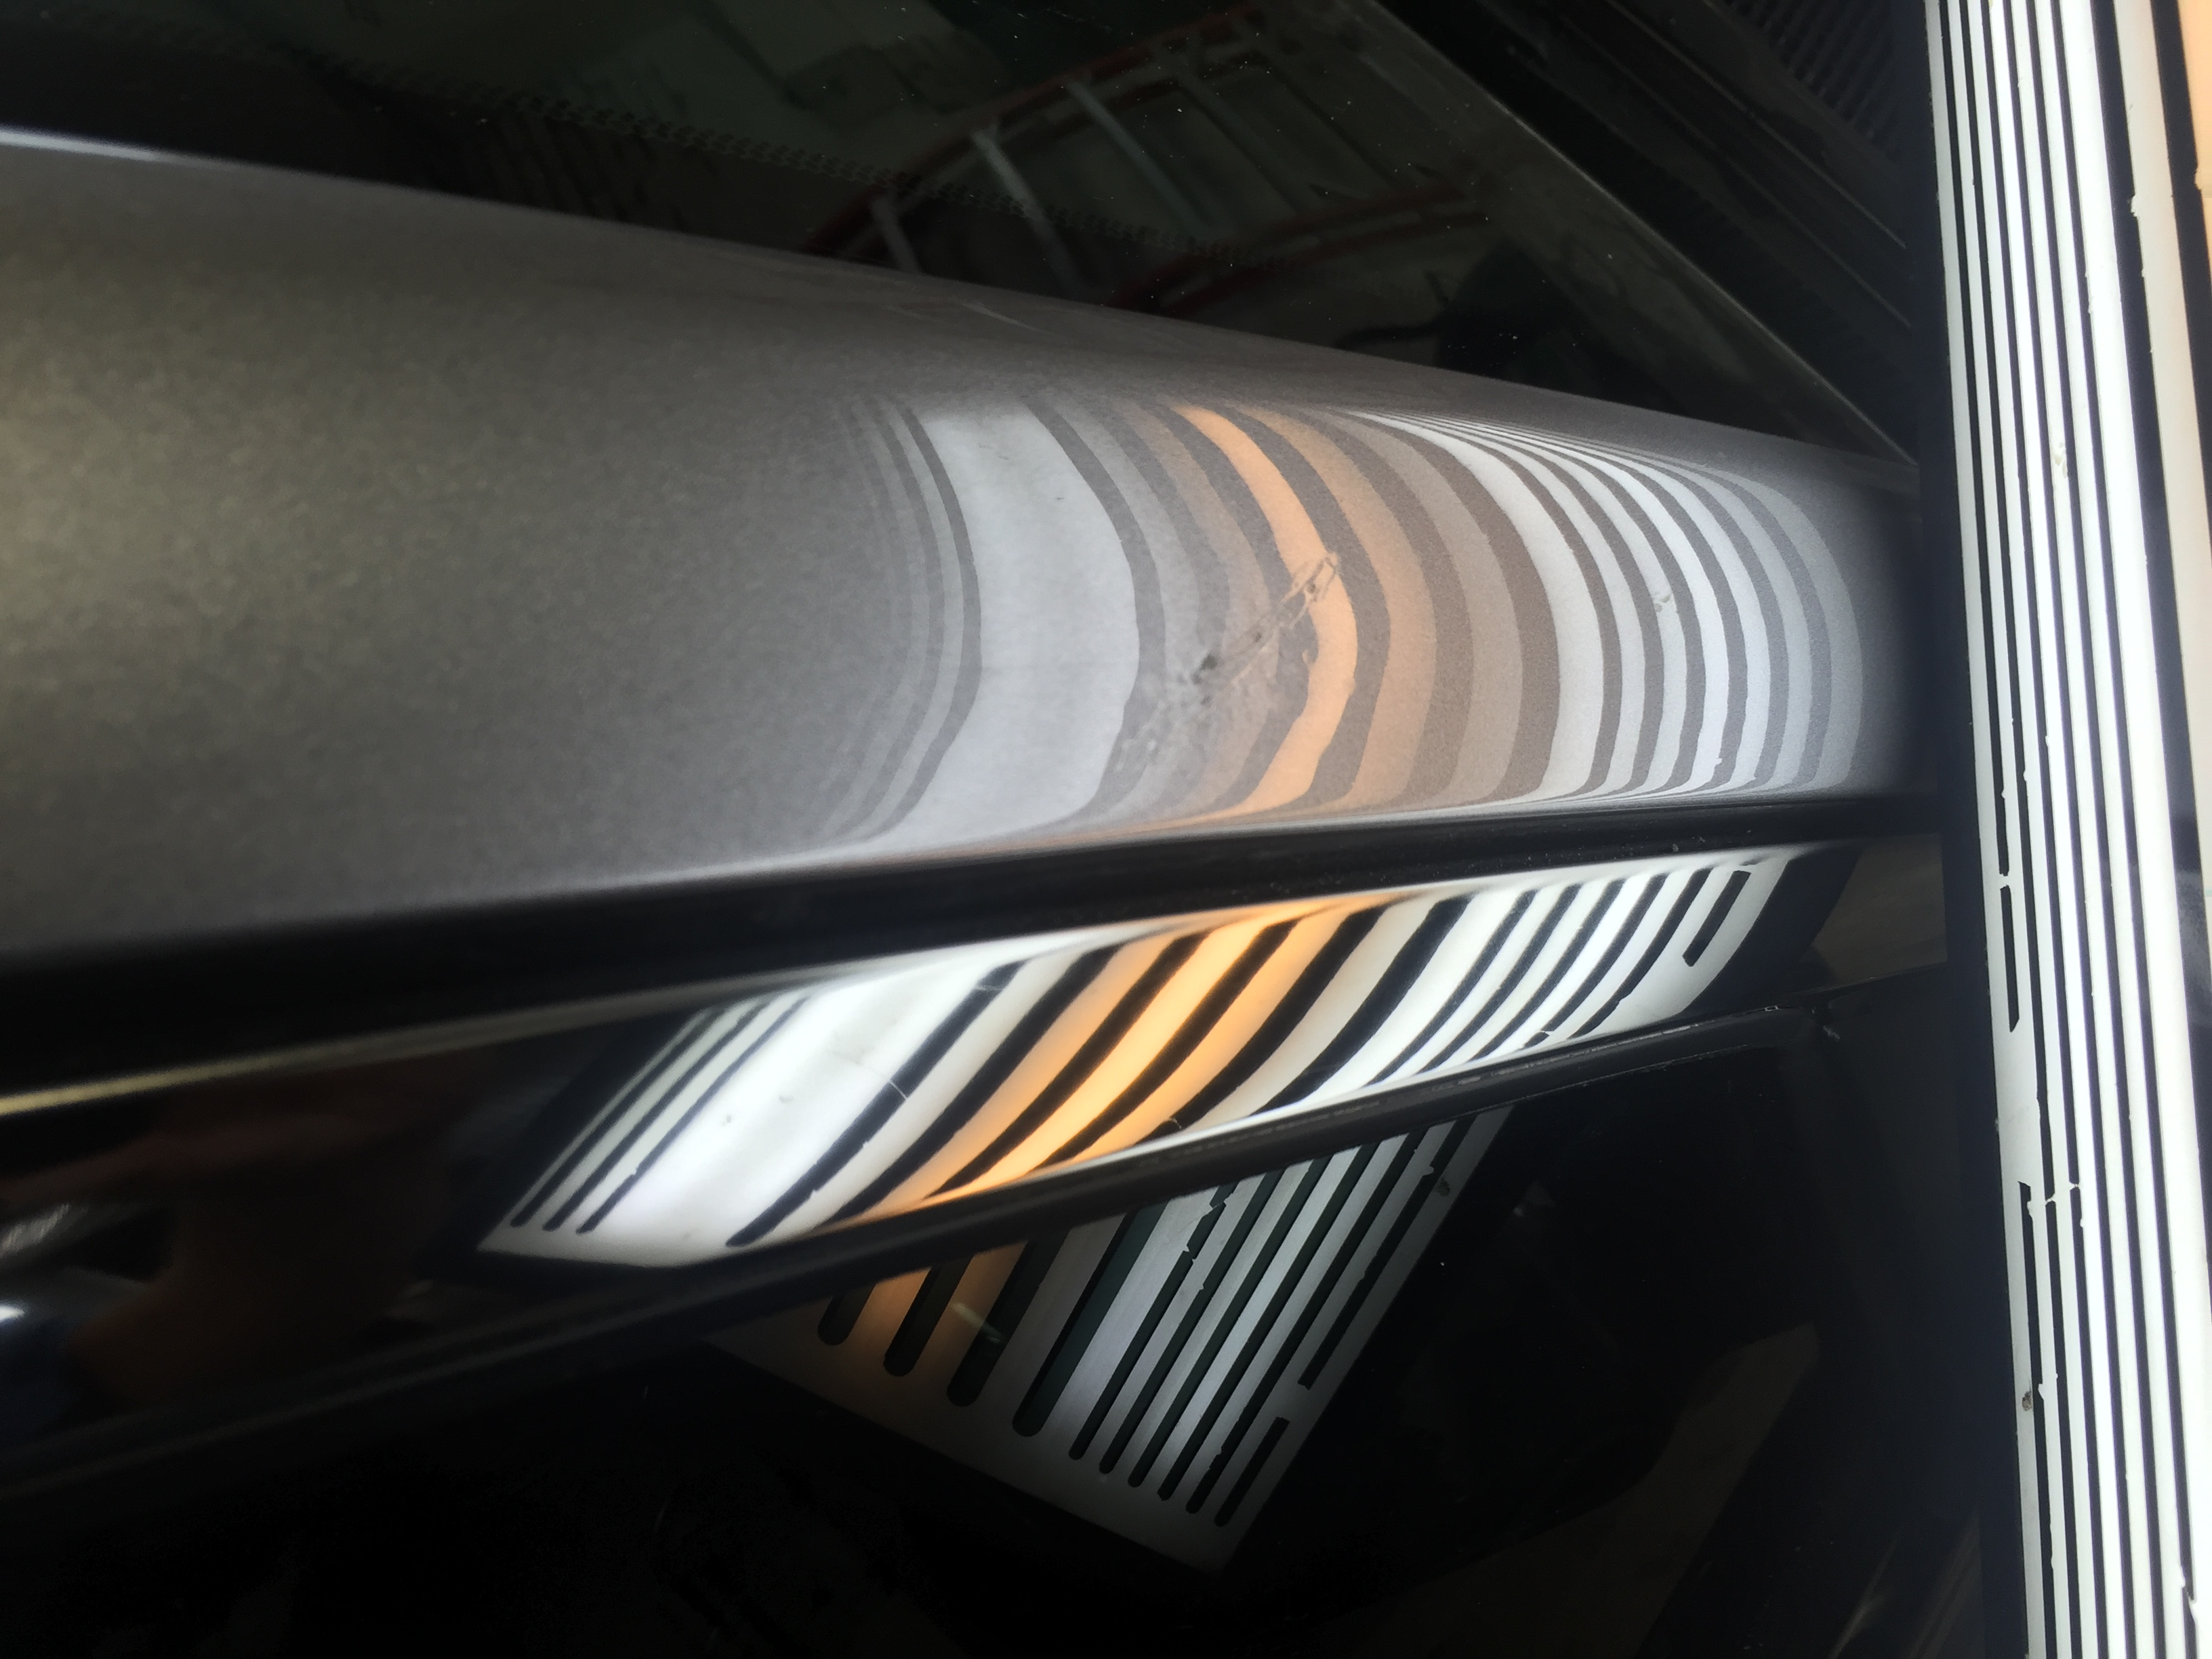 2015 Chrysler 300 Sharp Dent Removal on Pillar all glue pull, paintless dent repair, Springfield, IL http://217dent.com